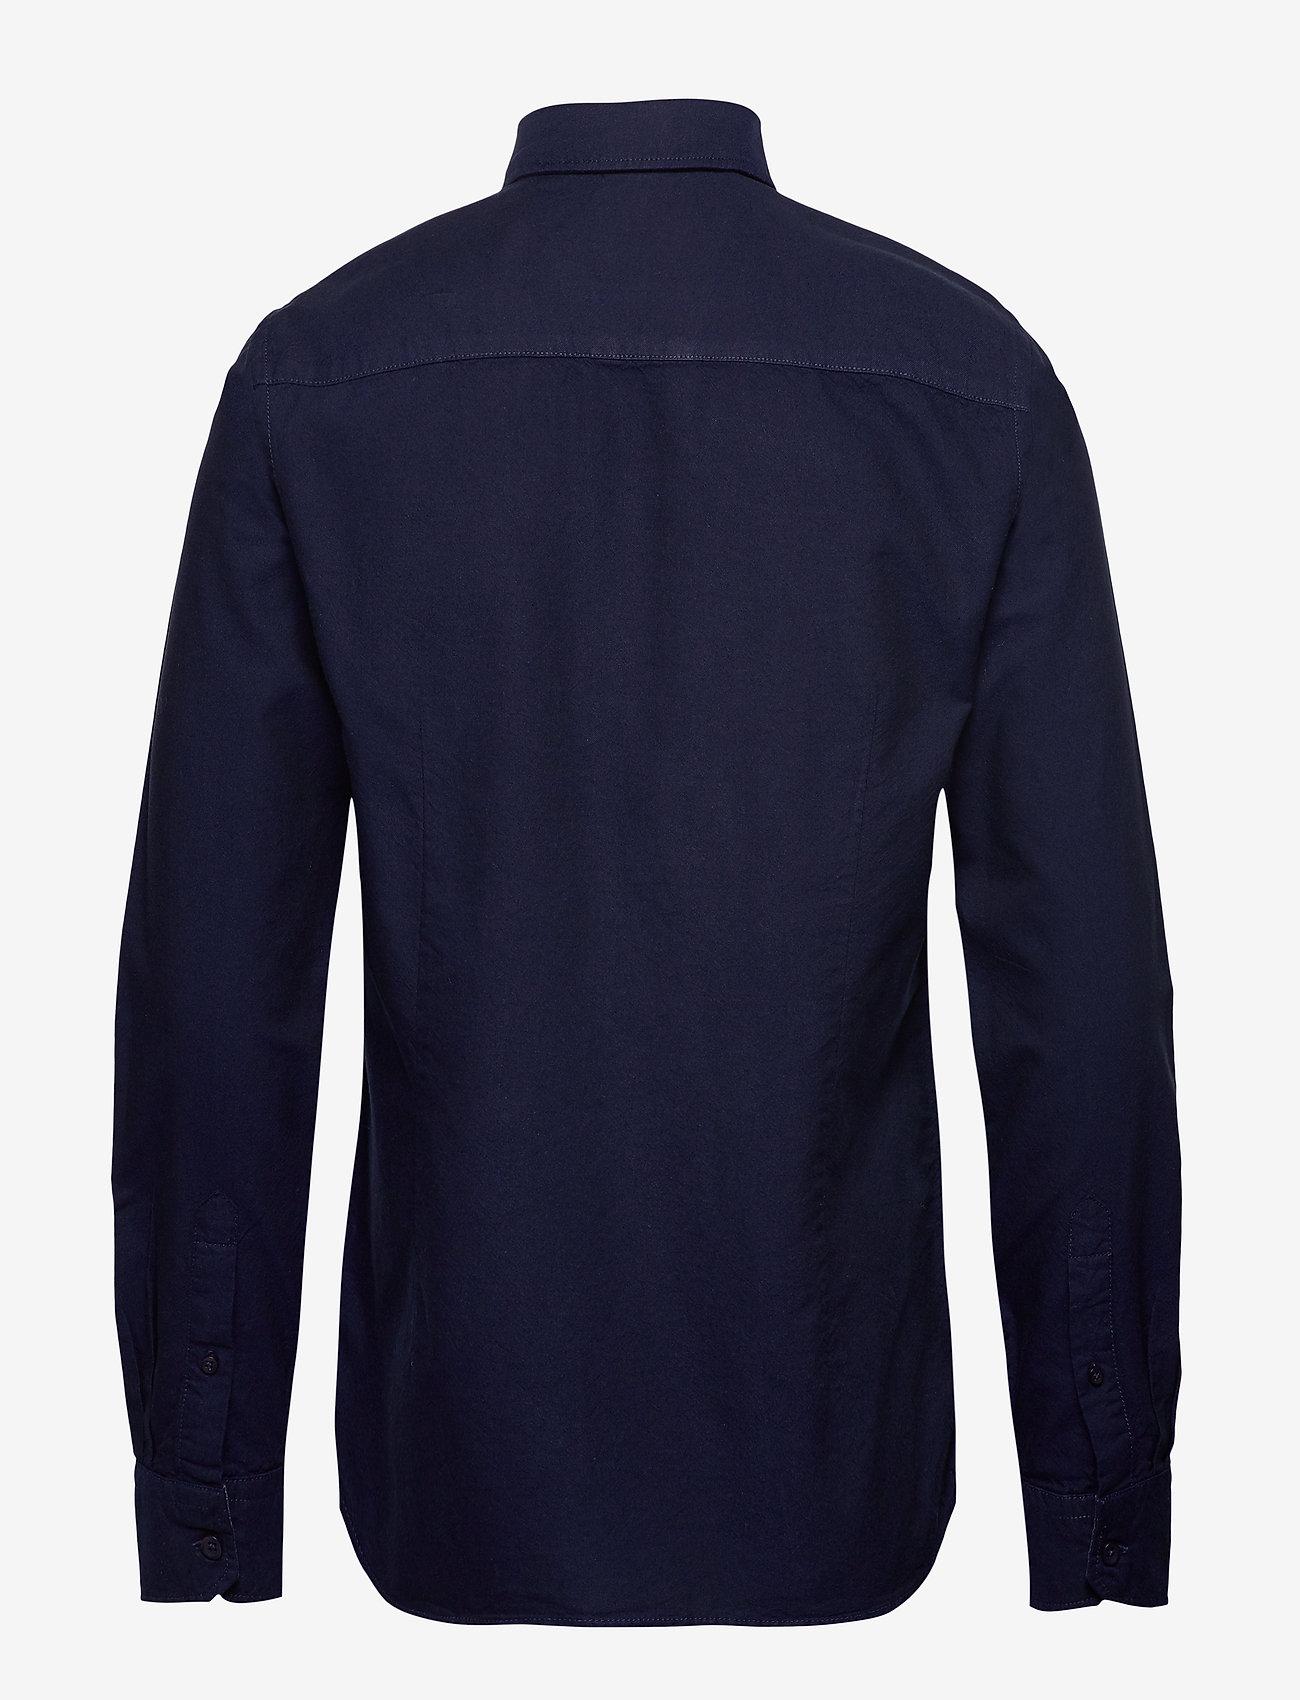 Blend - BHNAIL shirt Slim Fit - peruspaitoja - navy - 1